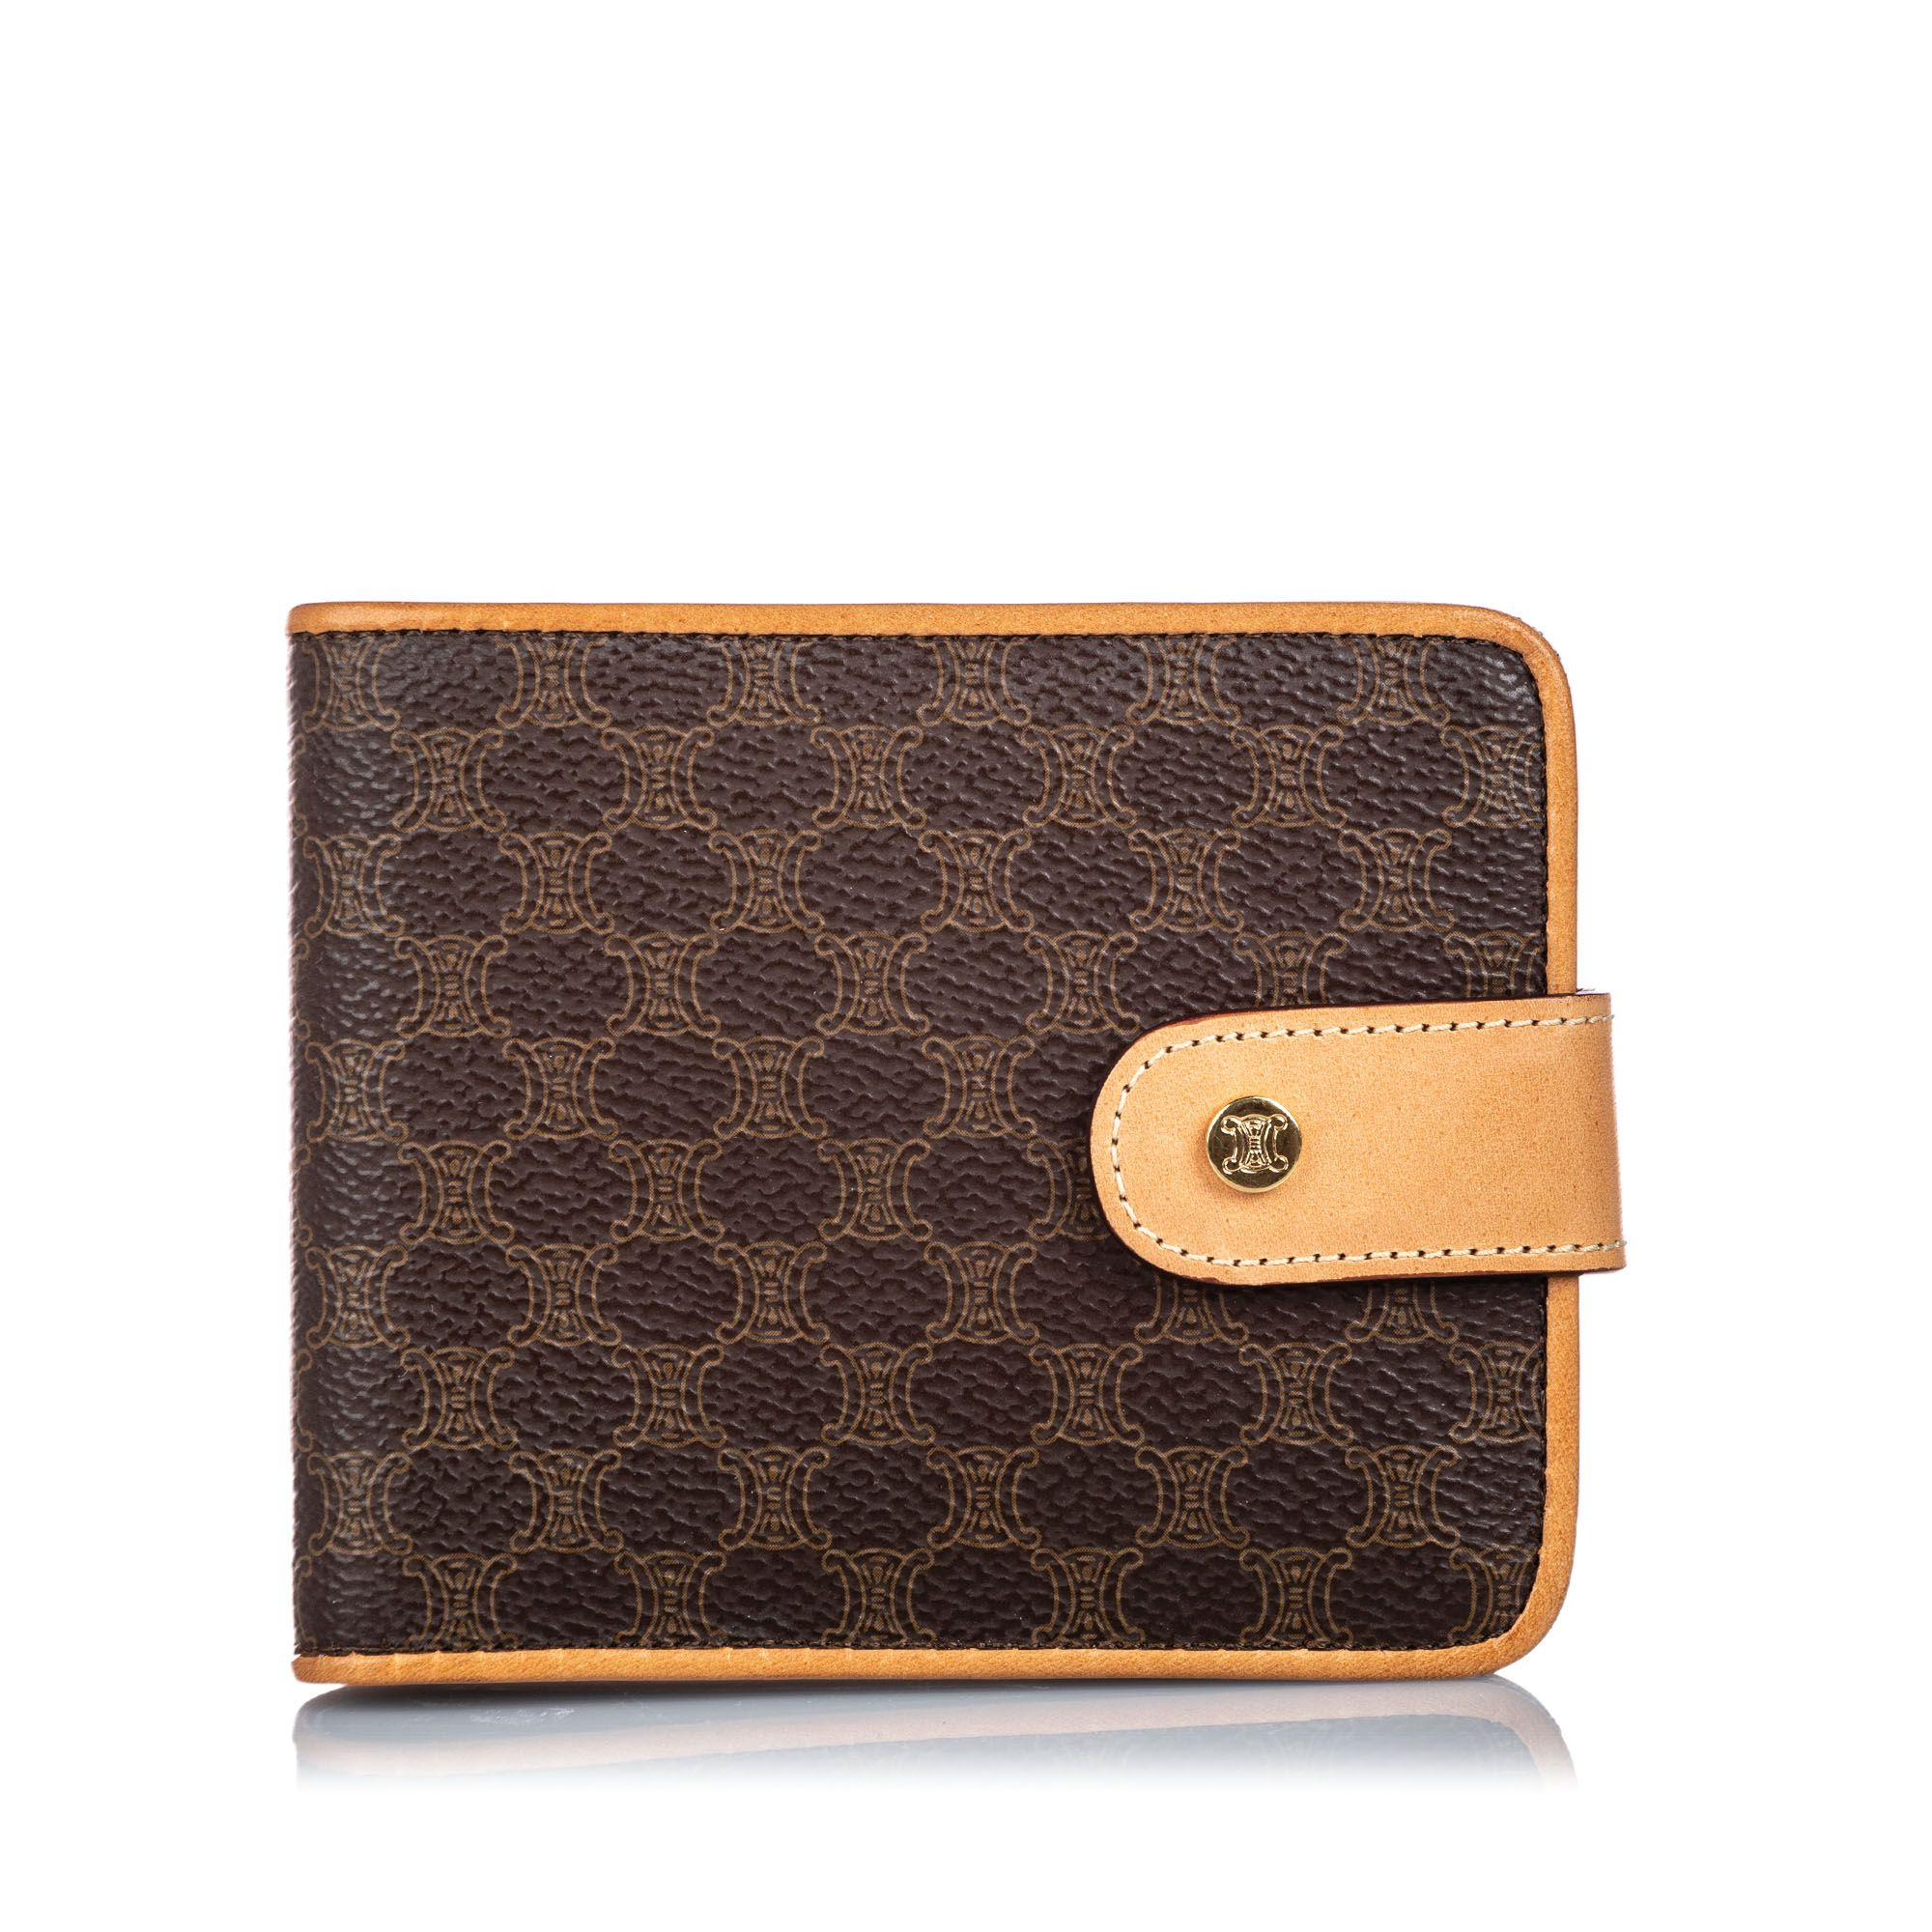 Vintage Celine Macadam Small Wallet Brown